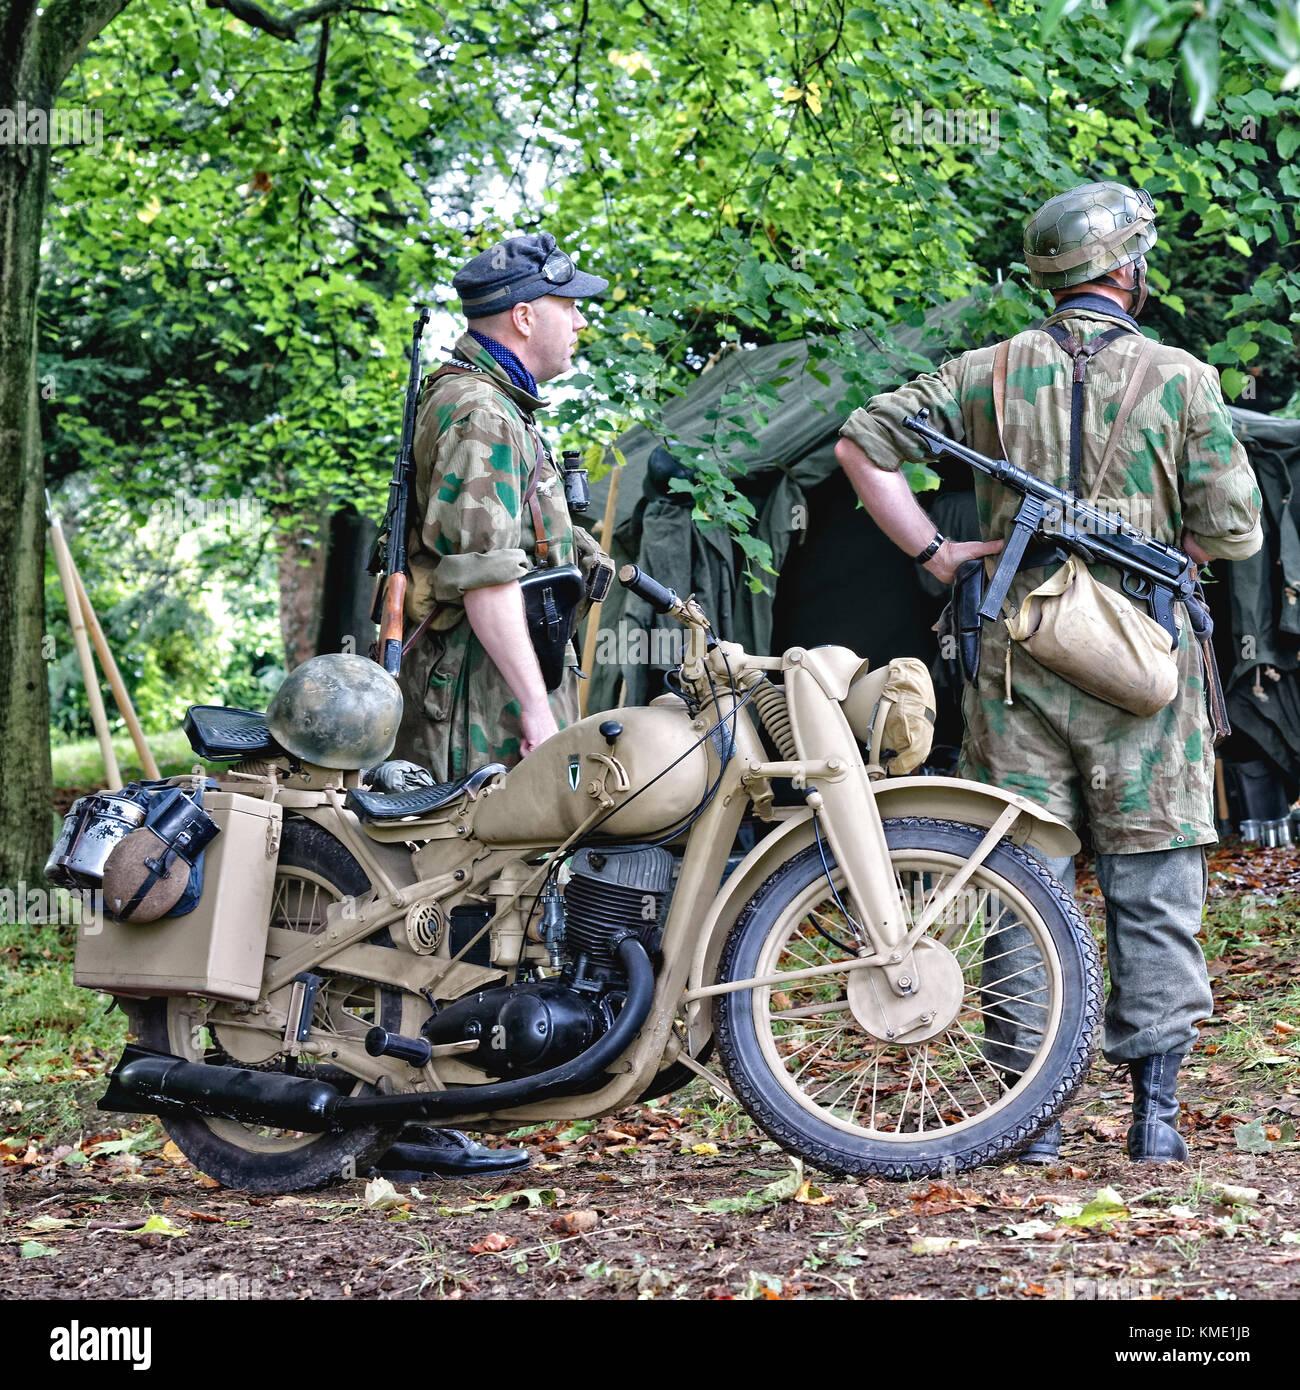 DKW NZ 350-1 German Army WW2 motorcycles & Wehrmacht soldiers with Sturmgewehr 44 & Machinepistole 38/40 - Stock Image